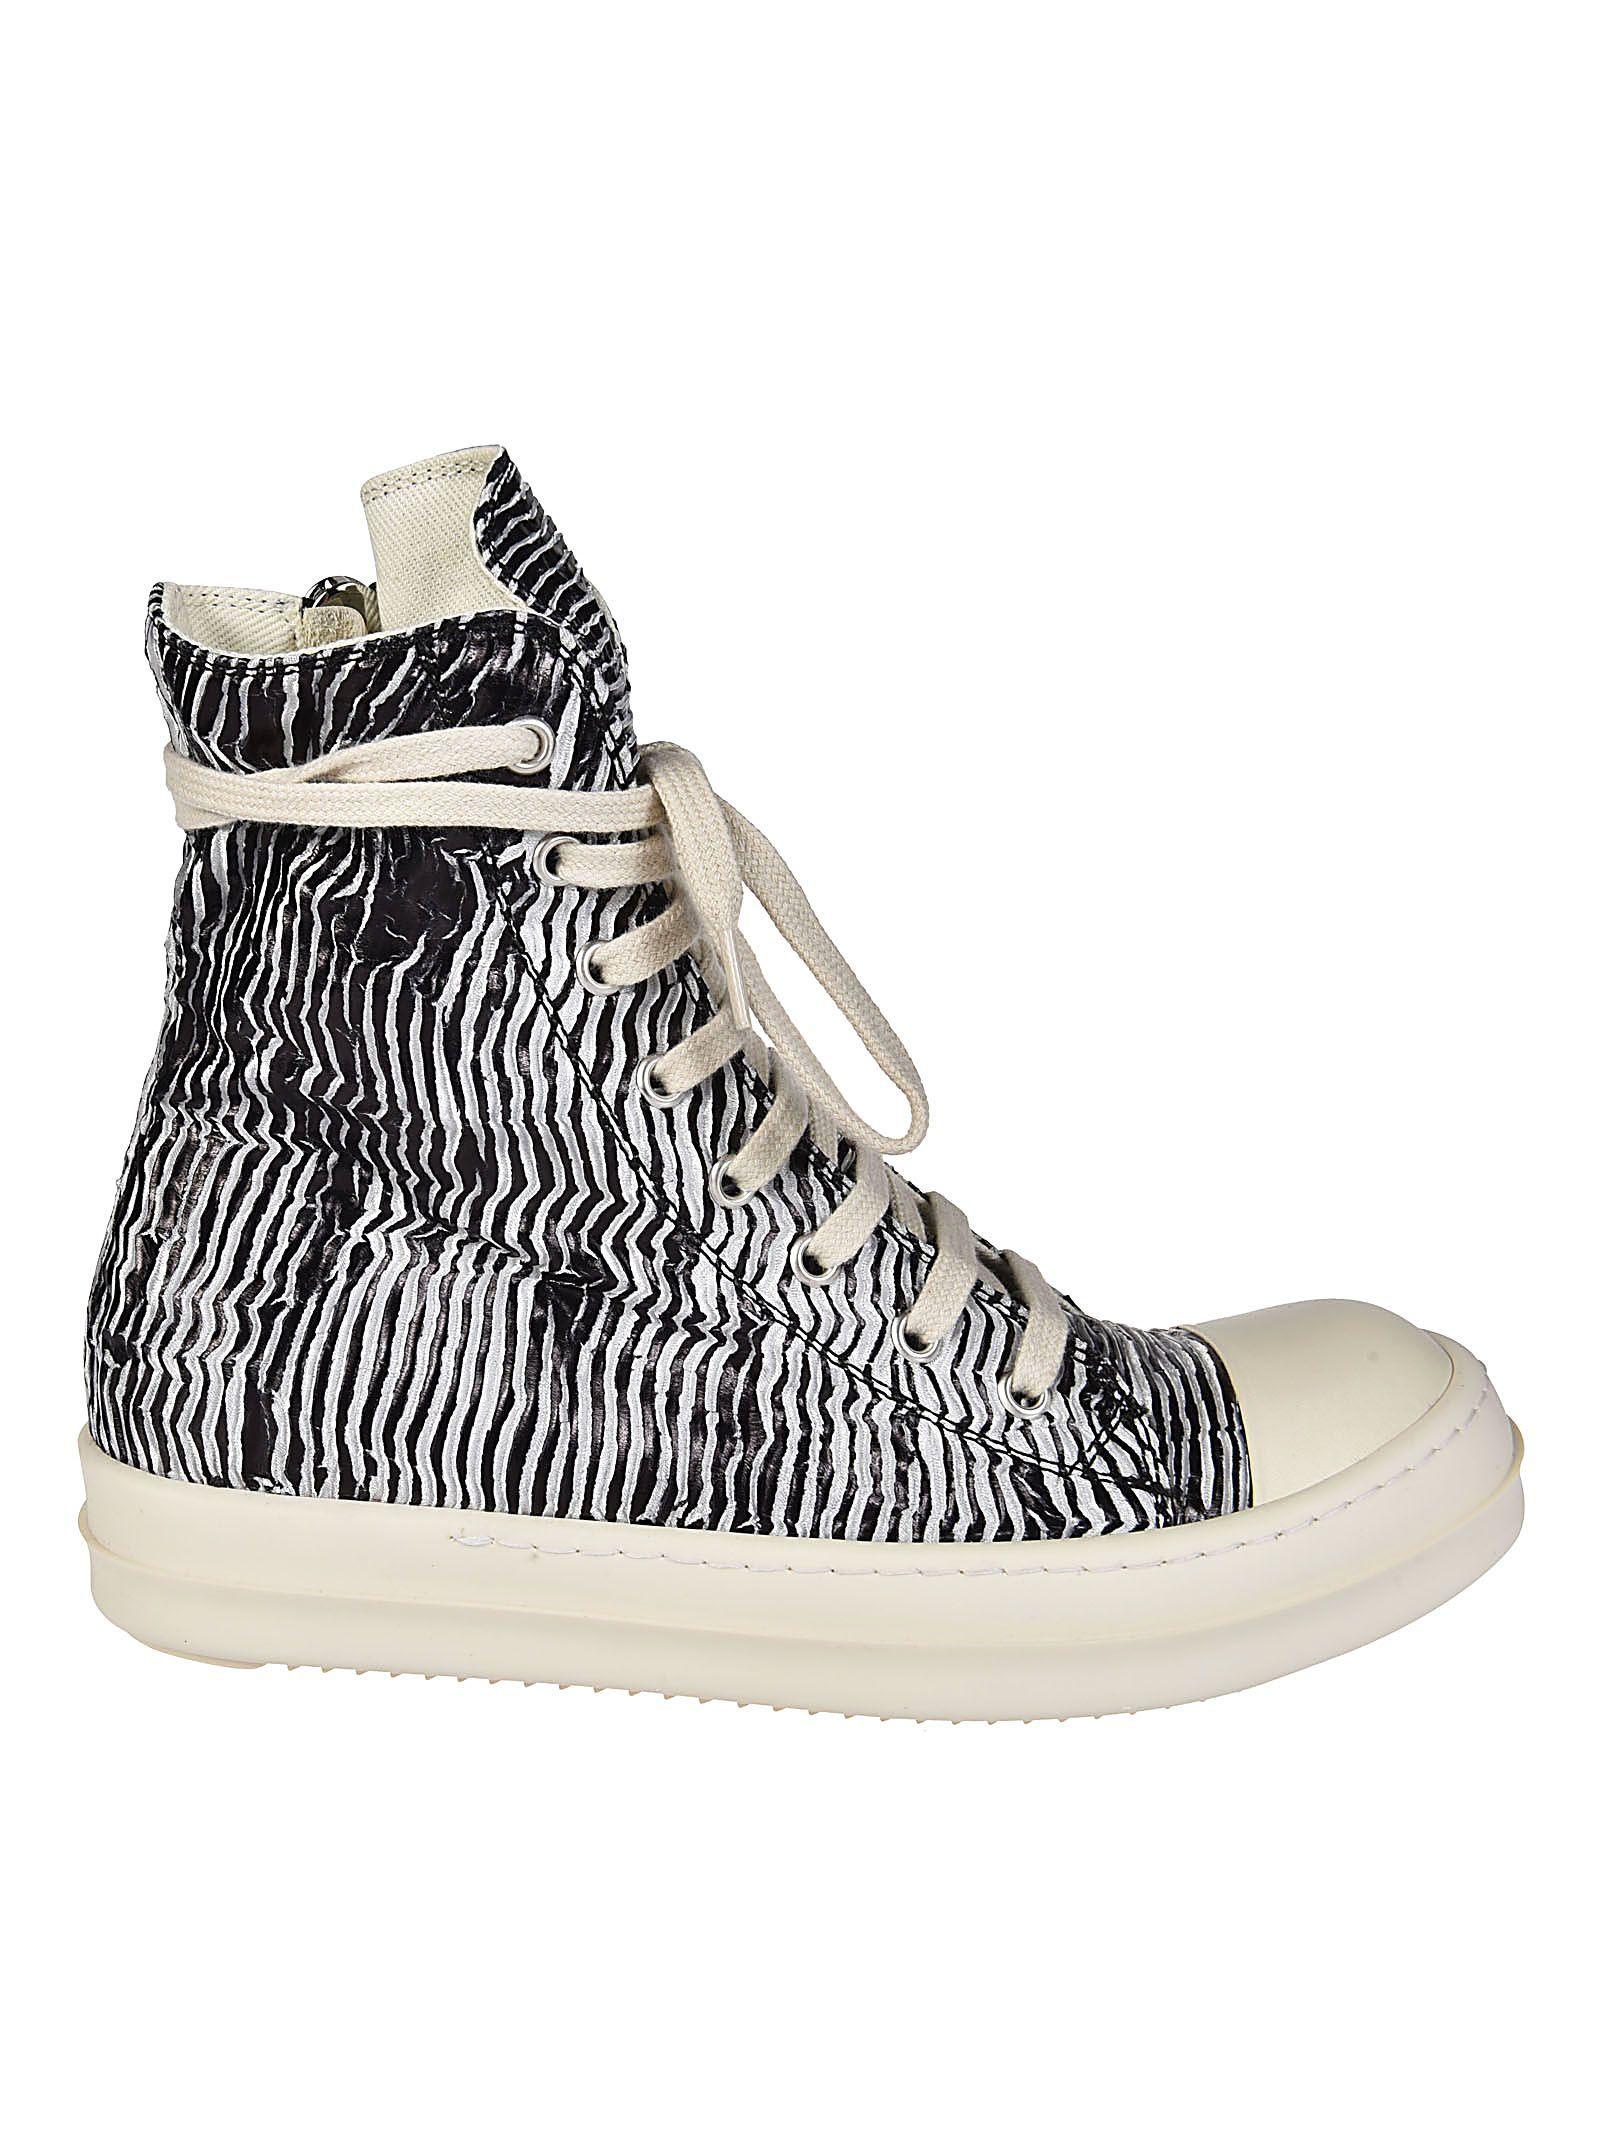 Rick Owens Metallic Zip Hi Top Sneakers Cheap Price Wholesale Cost Cheap Price Sale Best Seller GJsQlNHP